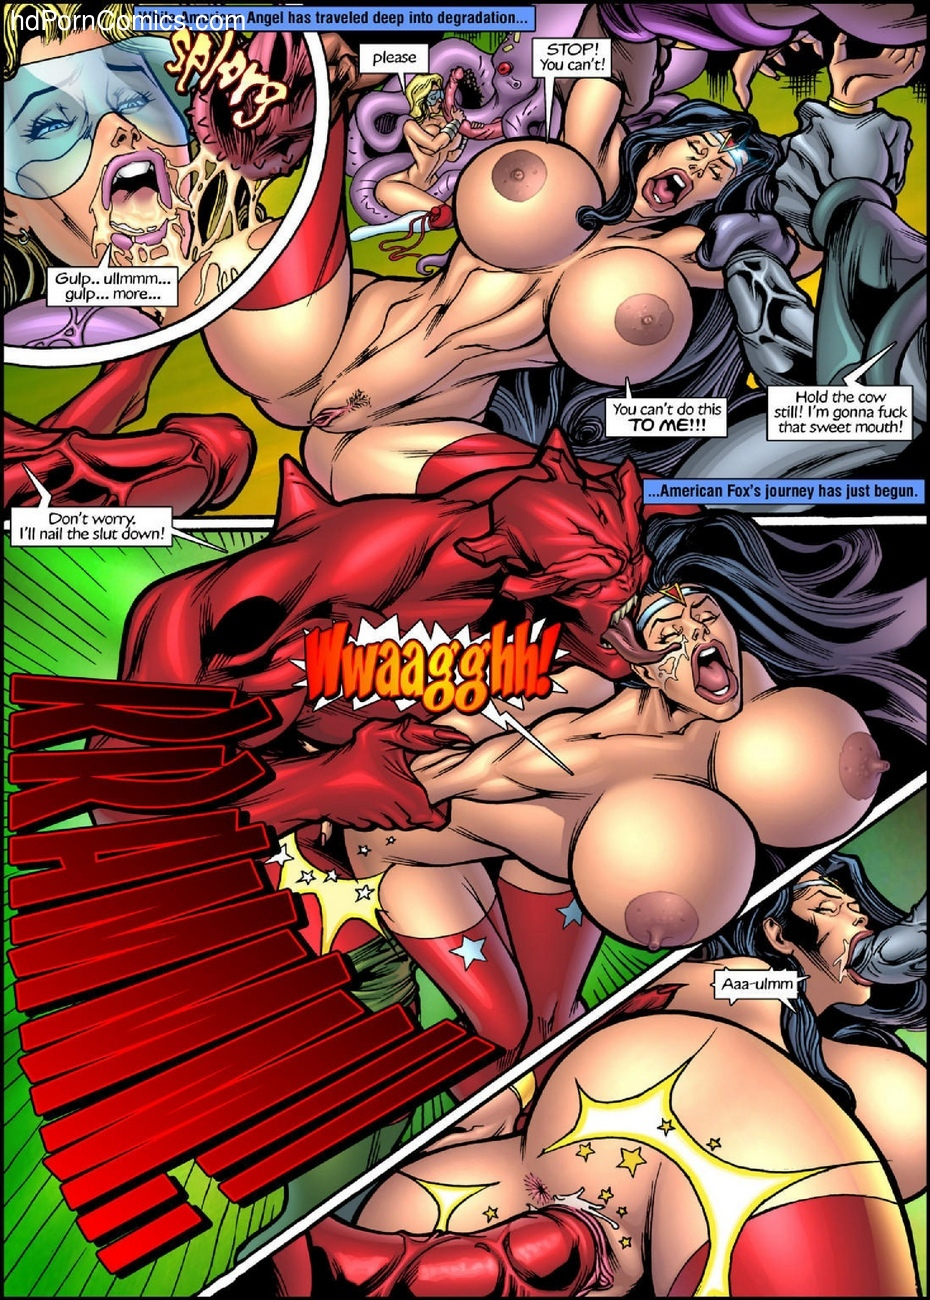 Freedom Stars - Cattle Call 1 23 free sex comic